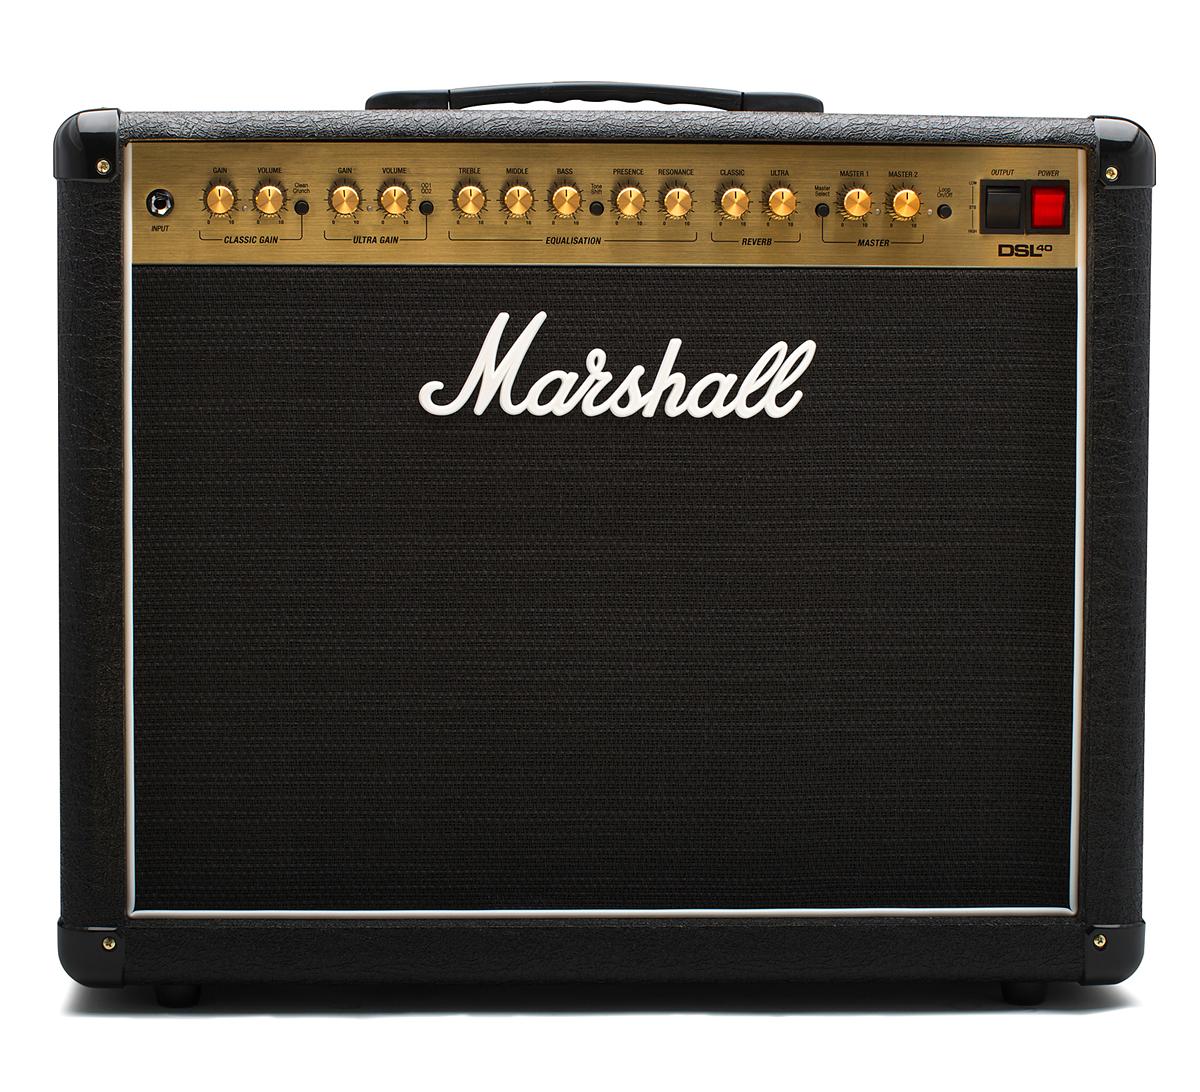 【40W/20W】Marshall DSL40C 新品 ギターコンボアンプ[マーシャル][MIDI機能][Guitar Amplifier Combo]